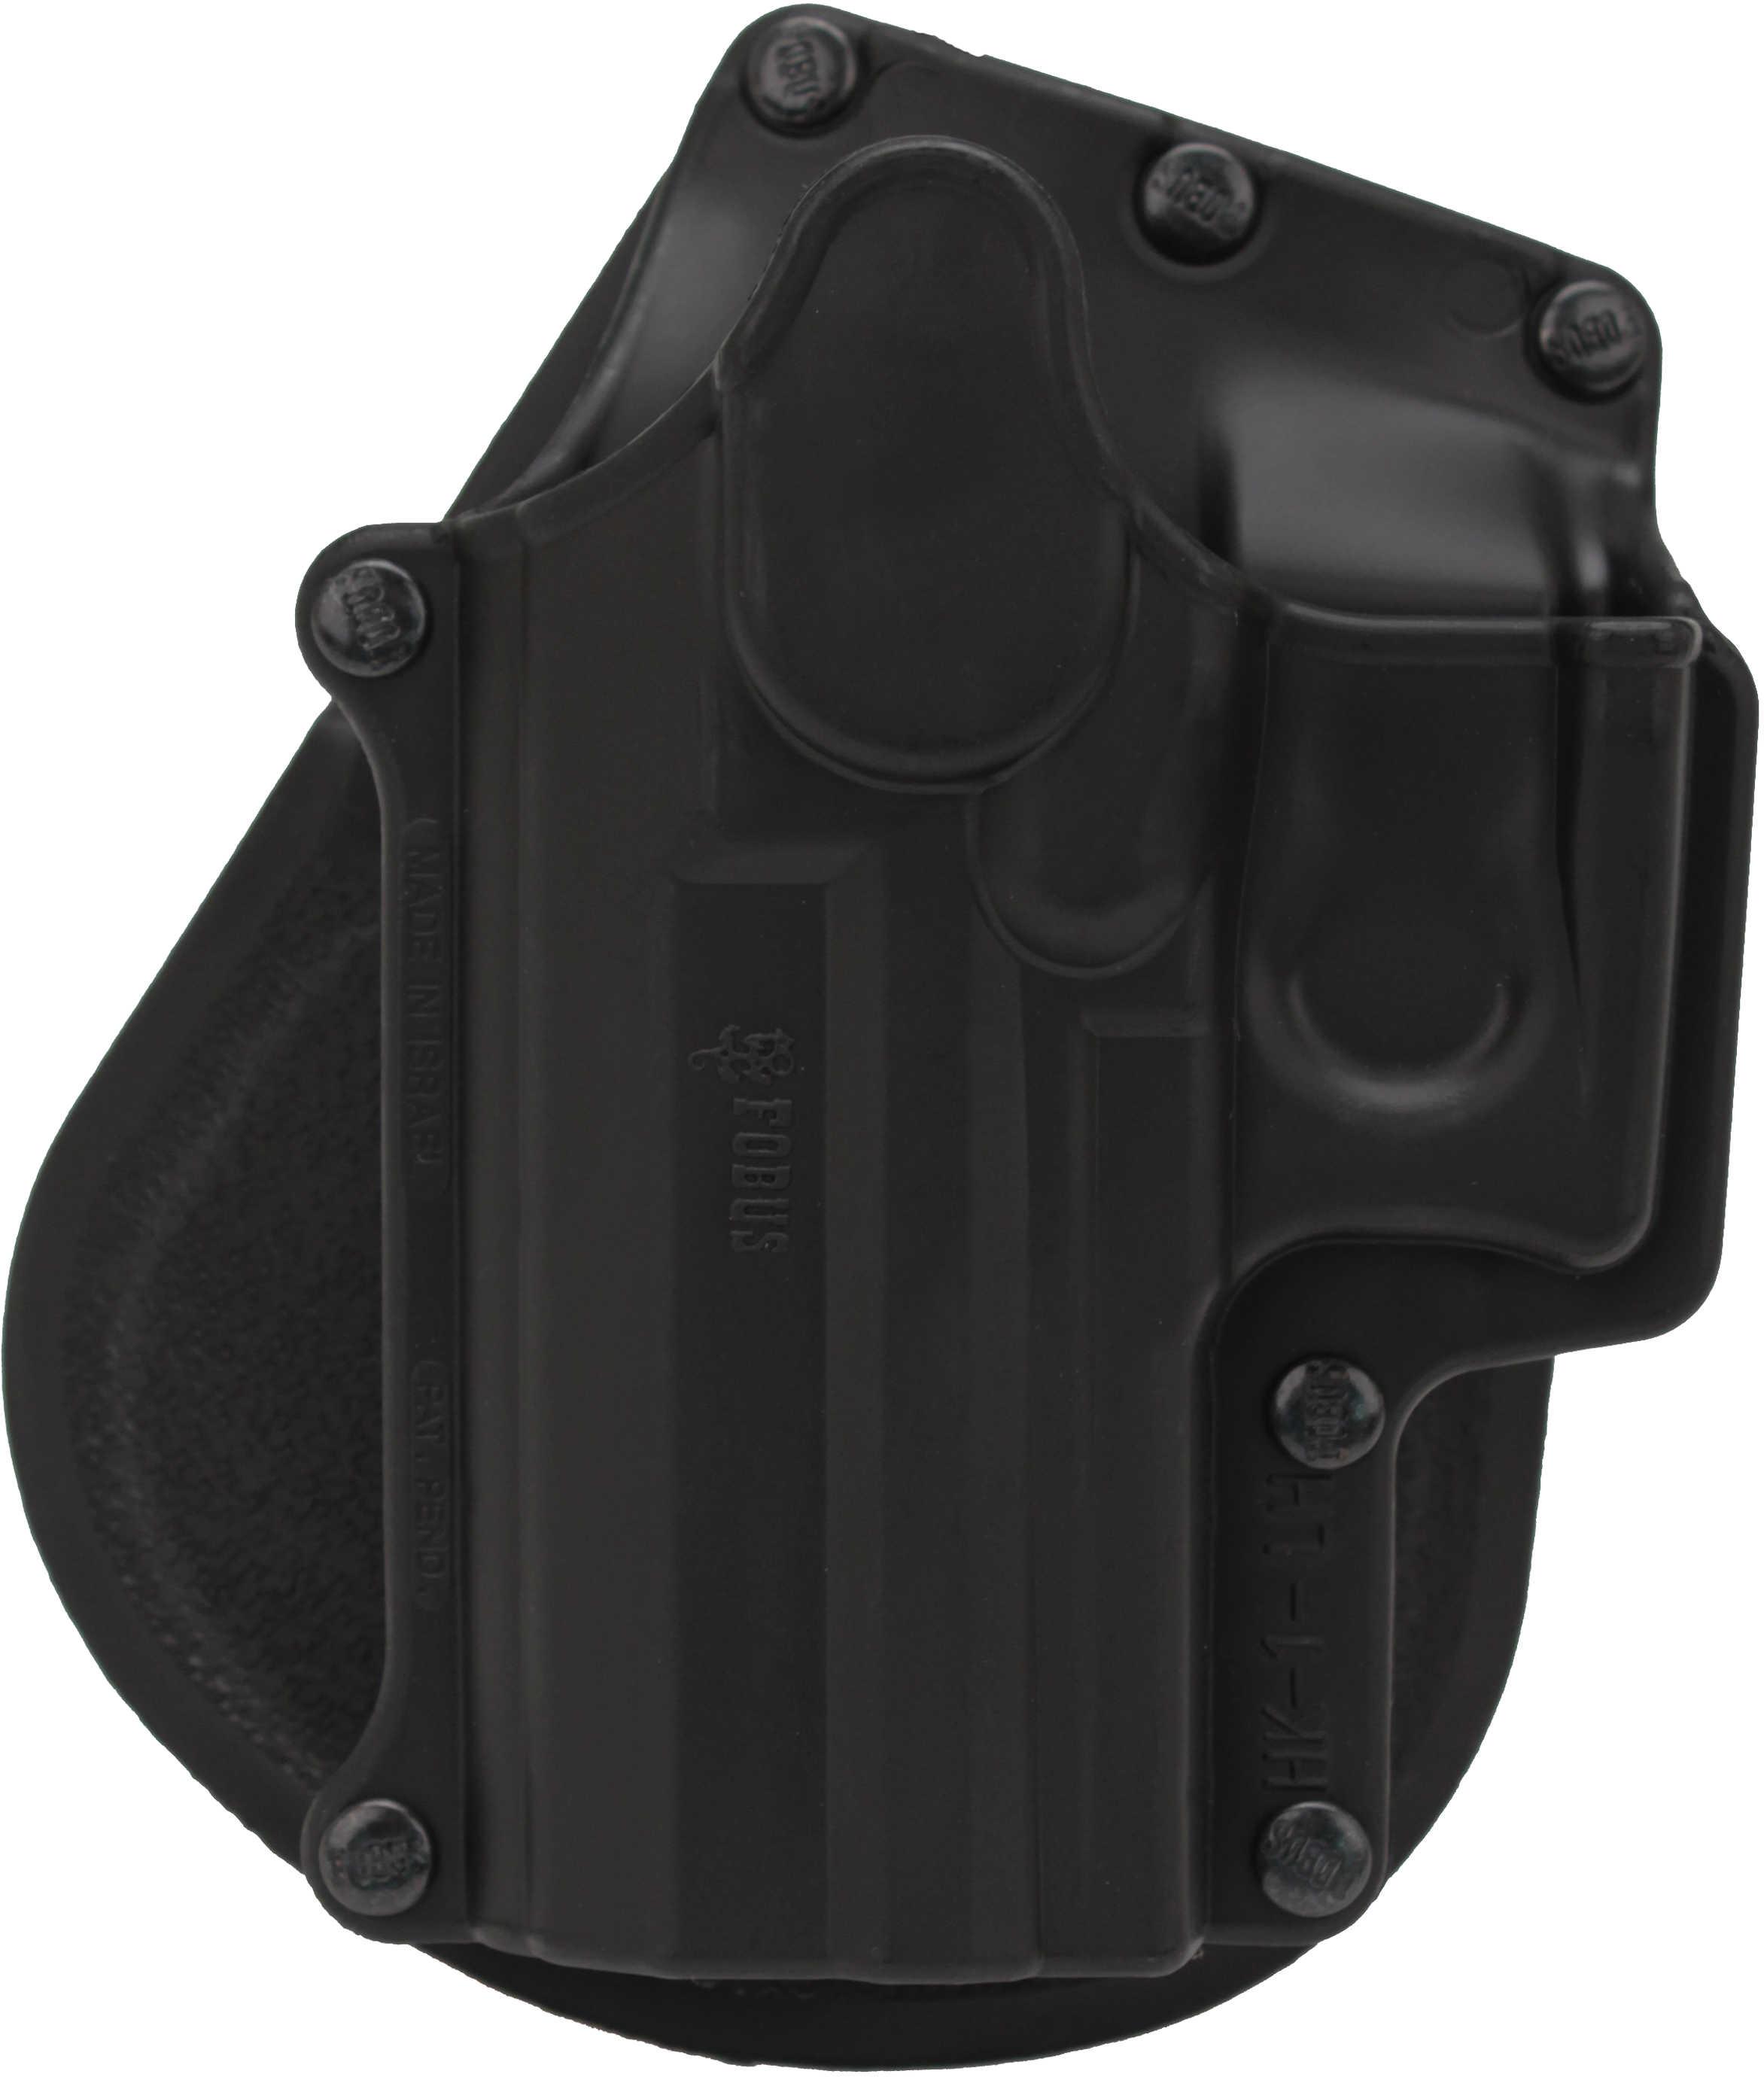 Fobus Paddle Holster Left Hand Black HK USP Full/Compact 9/40/45, S&W  Sigma, Ruger SR9 HK1LH